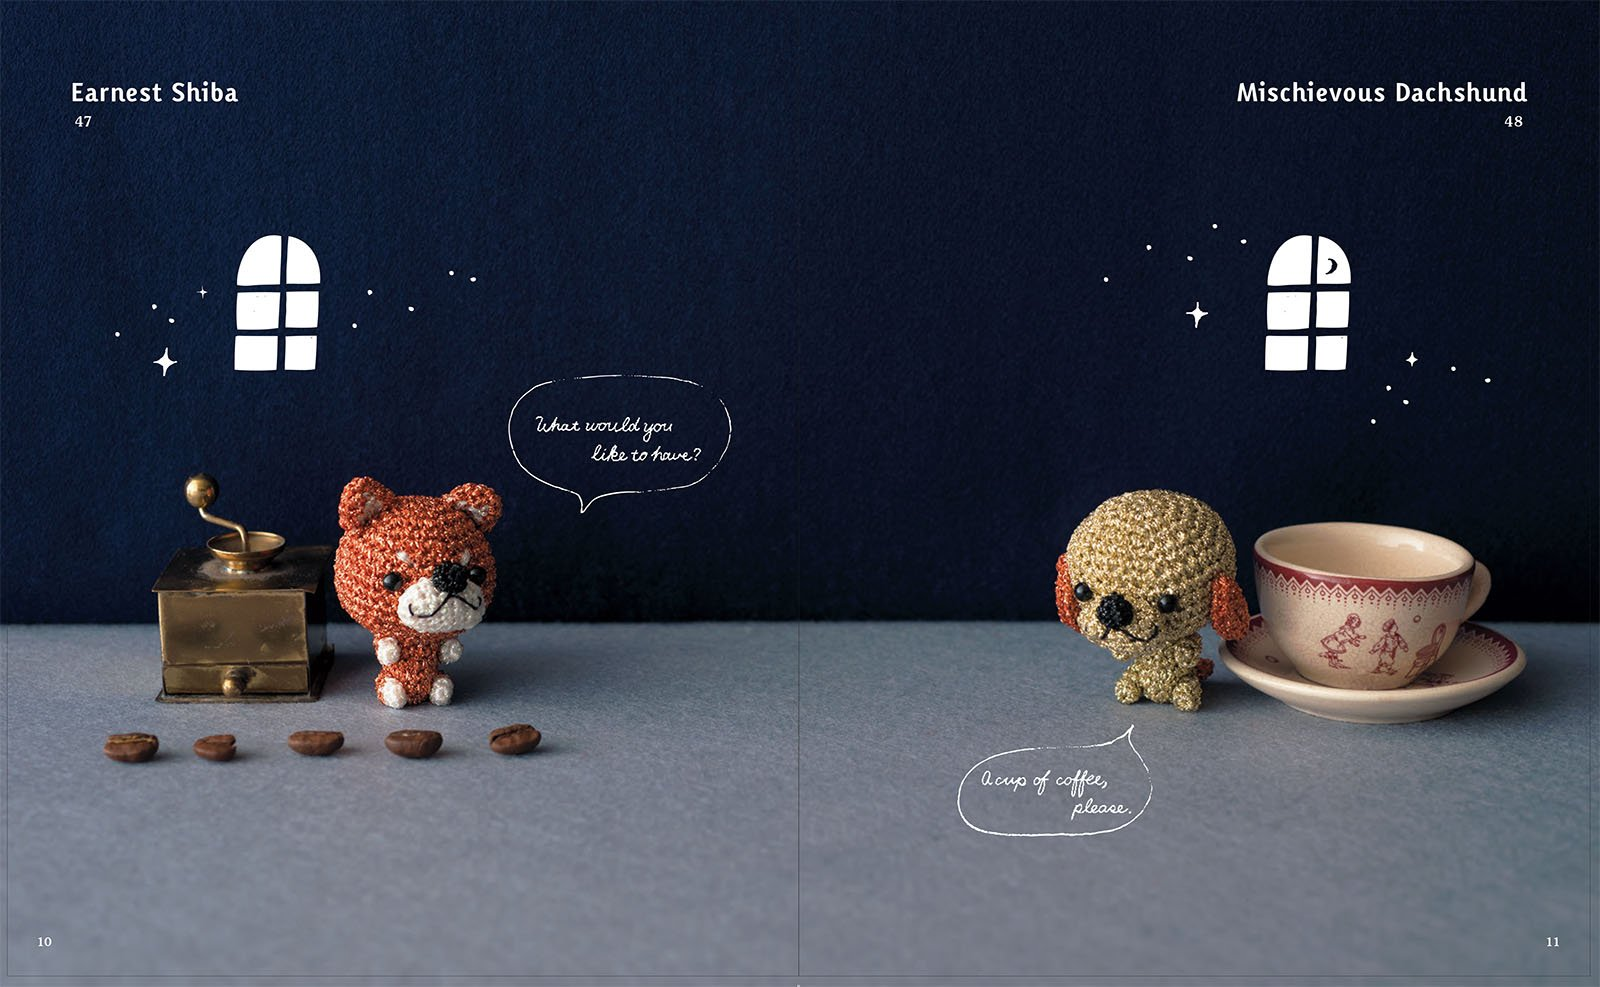 Amigurumi Animals To Make : Sparkling crochet make amigurumi animals with yarn that glitters